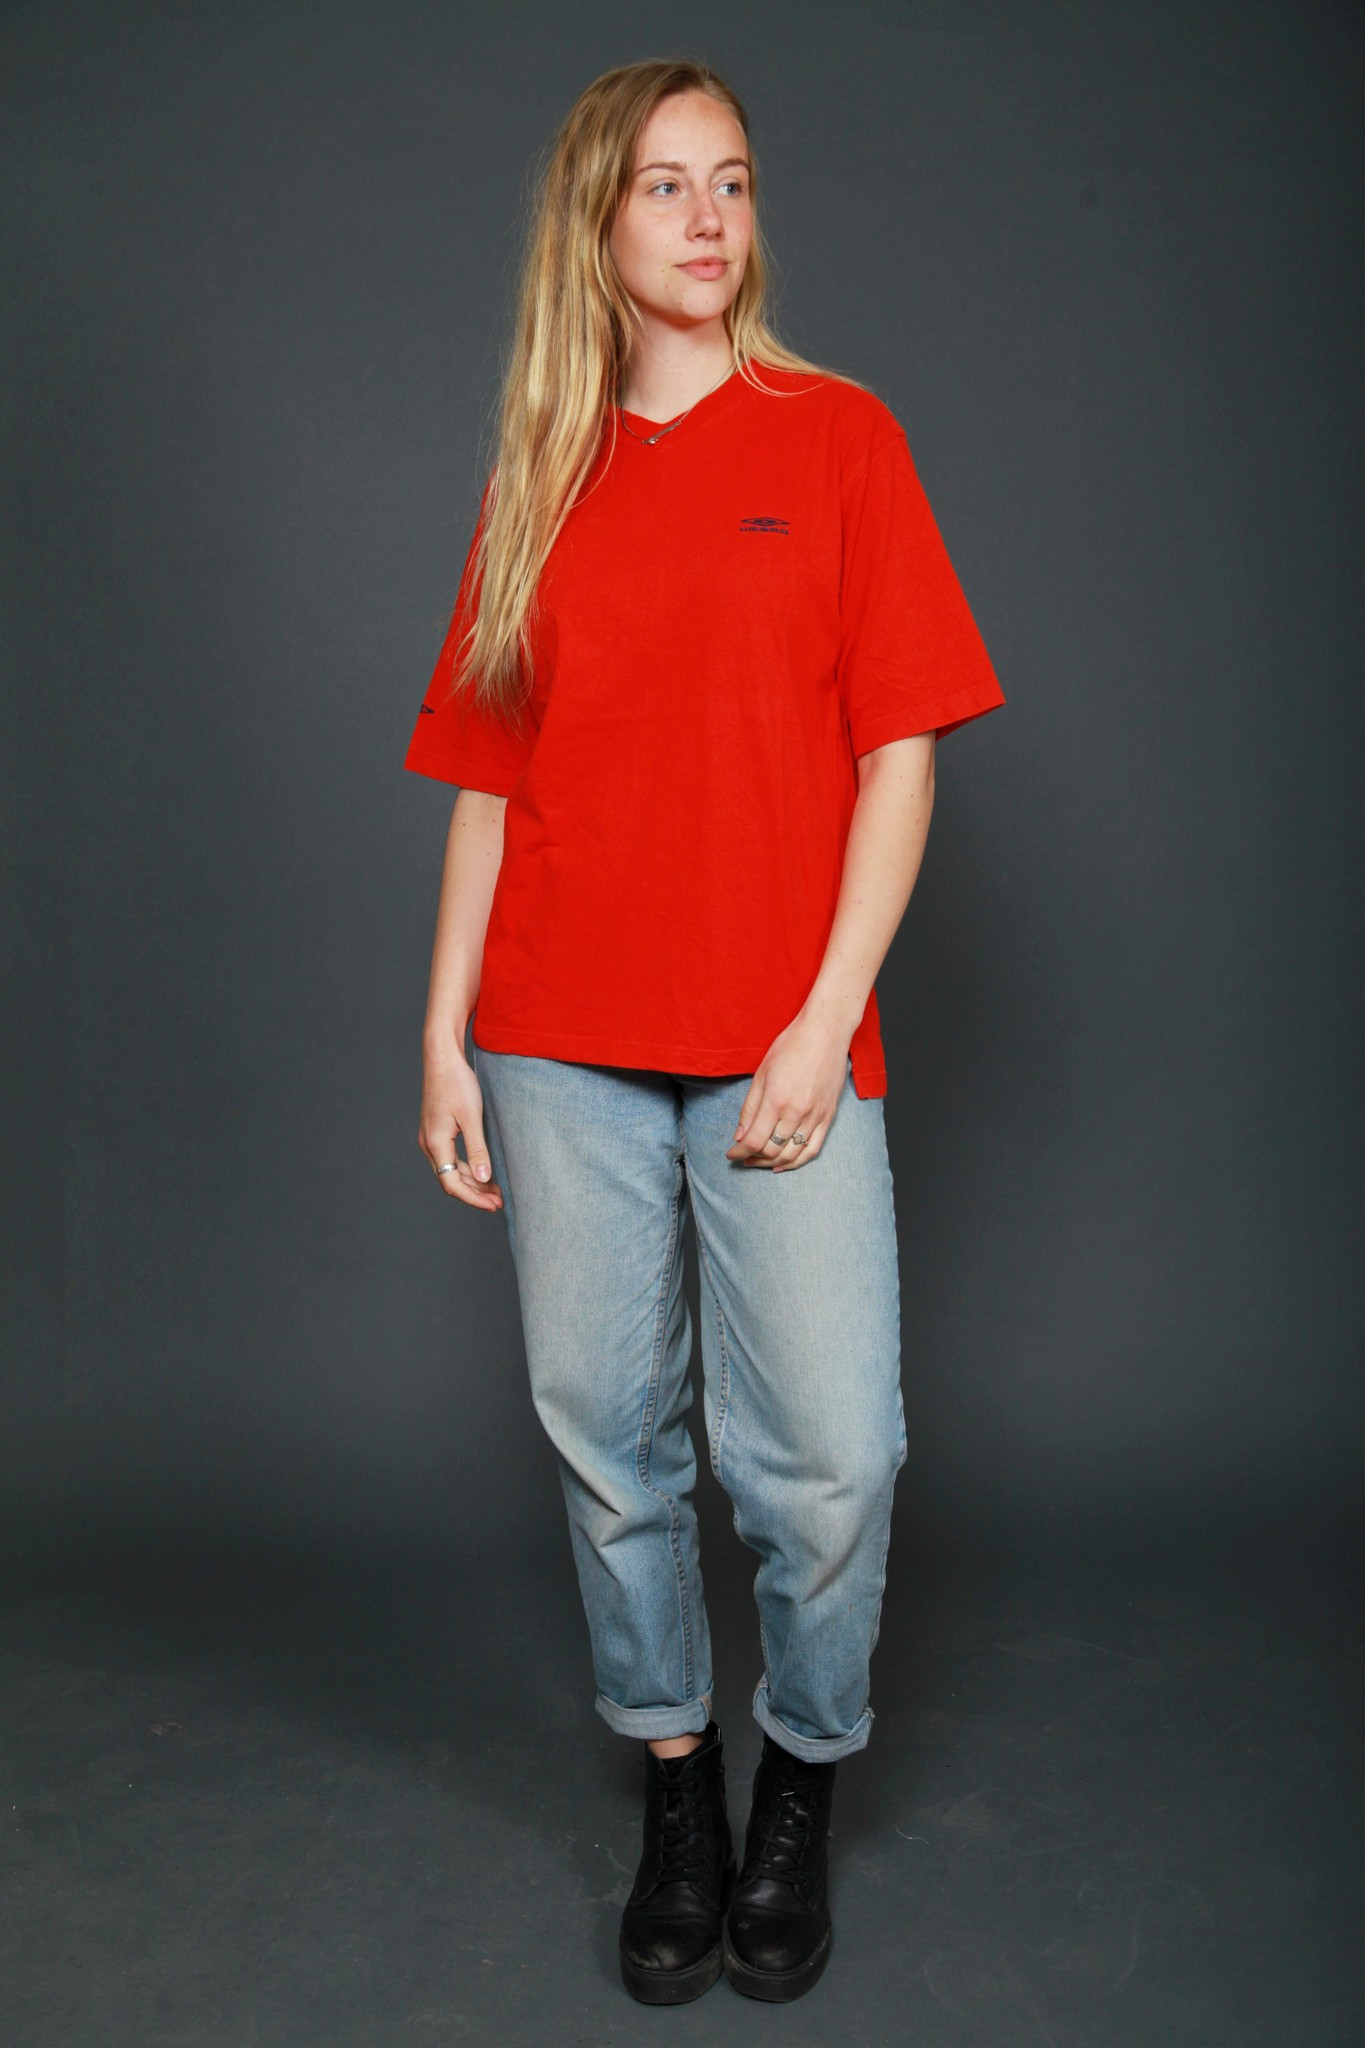 Red 90s Umbro shirt